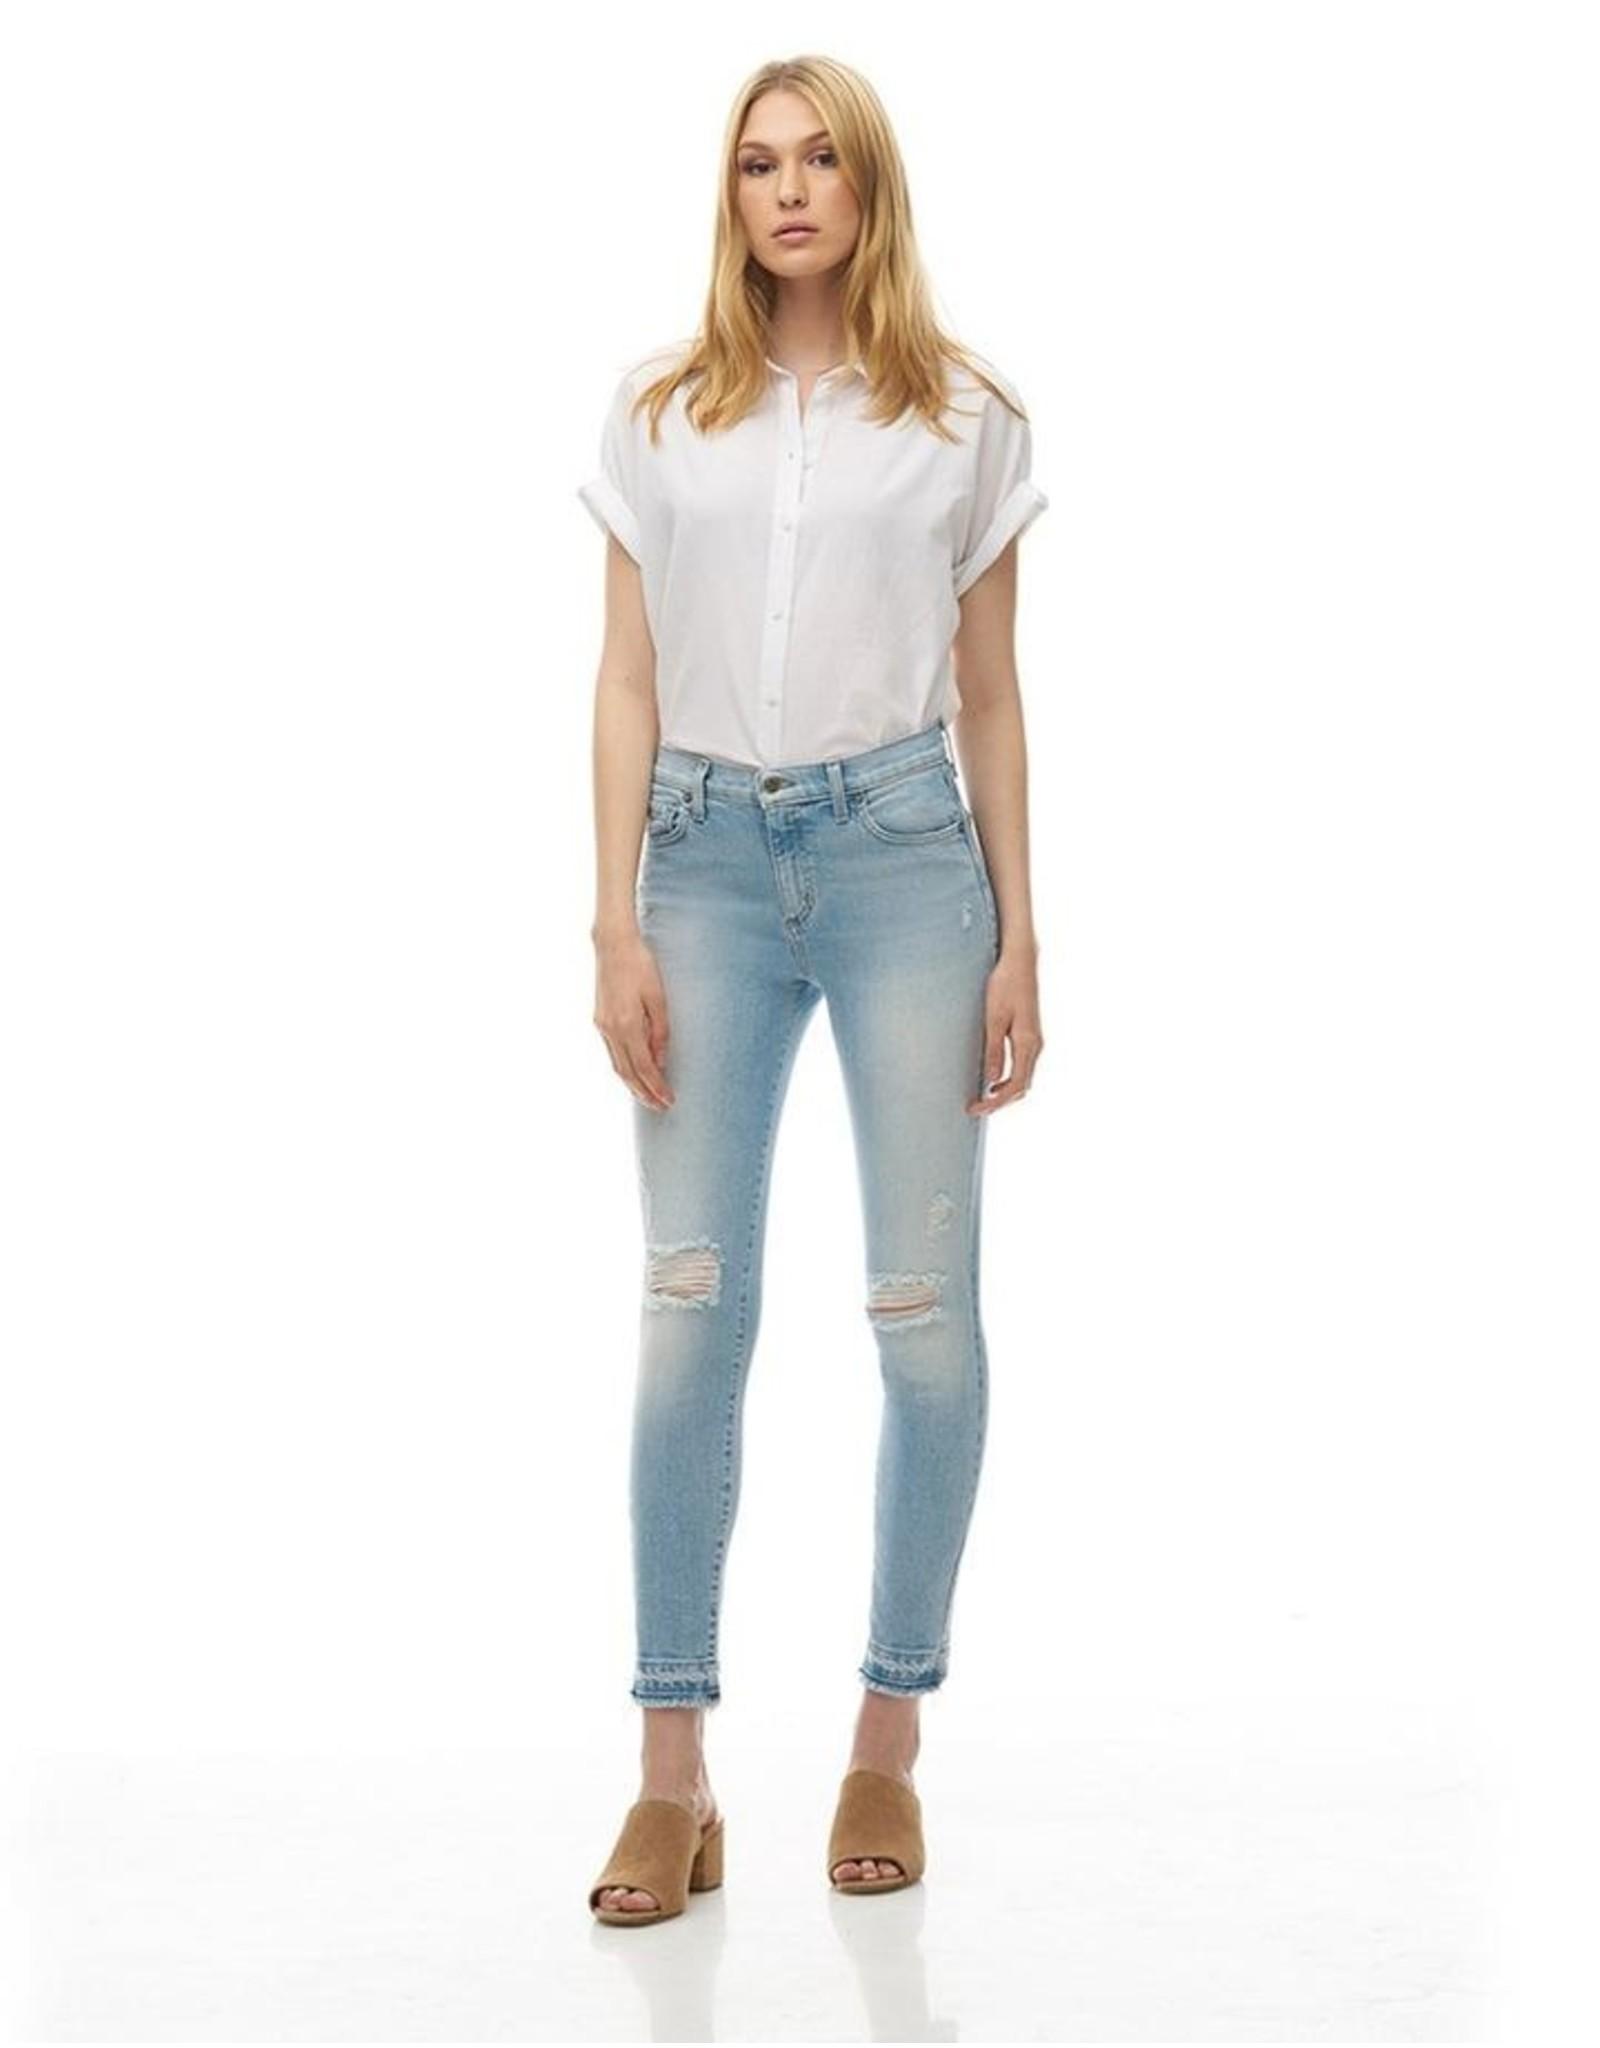 "Yoga Jeans - The Pier - 27"" Skinny"